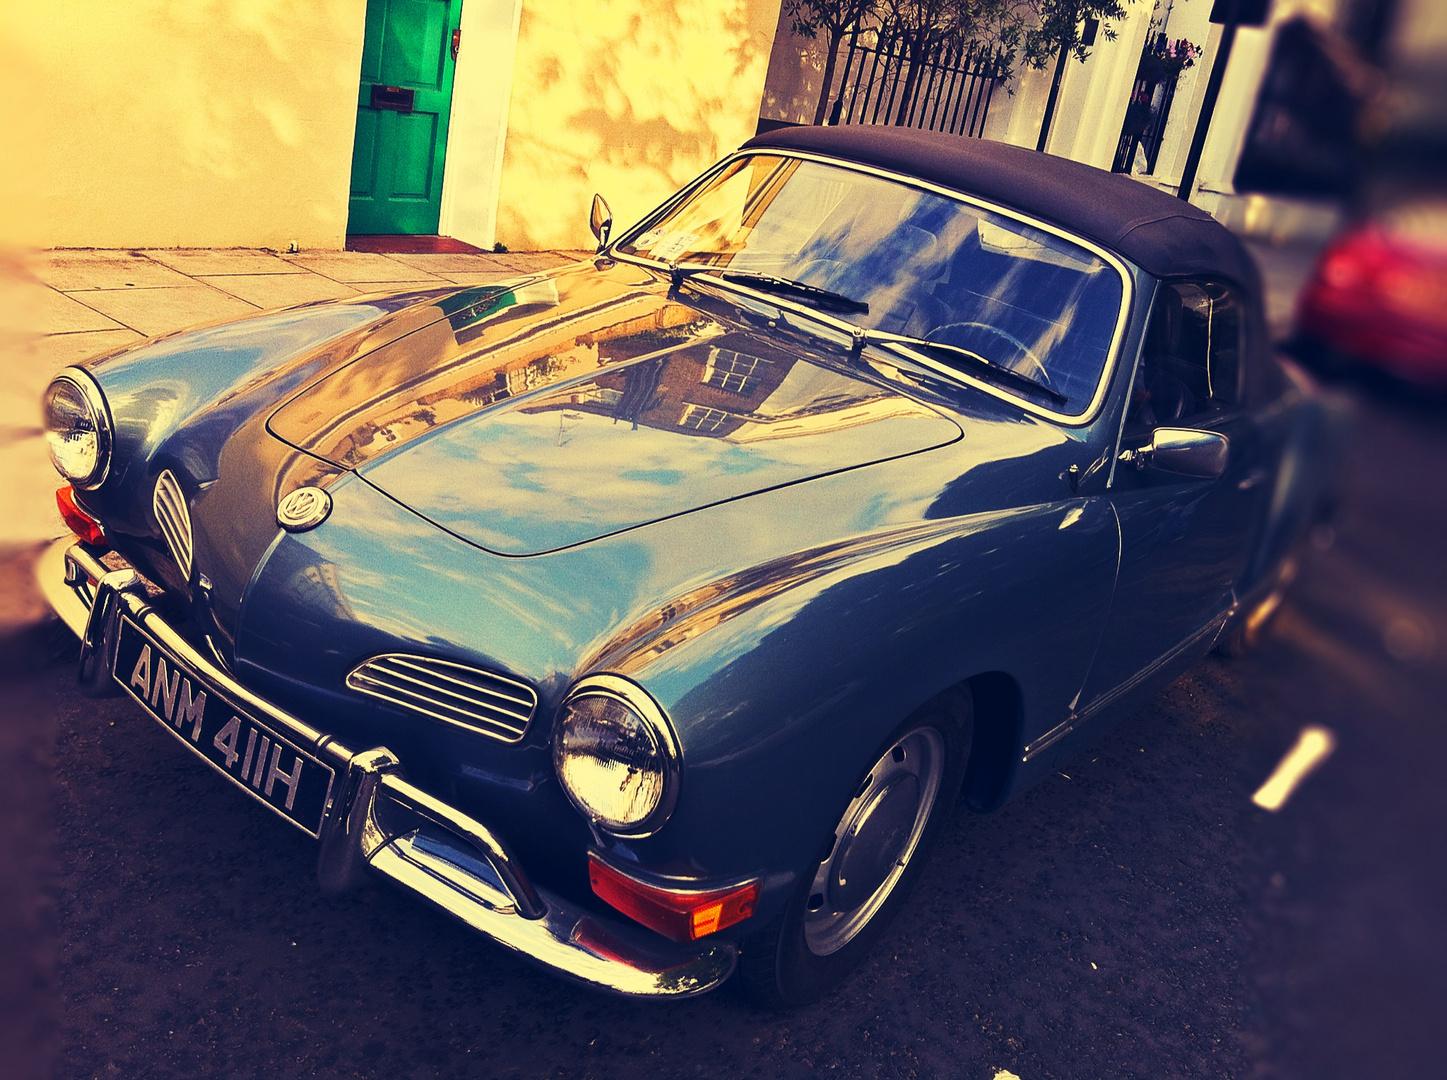 Notting Hill VW